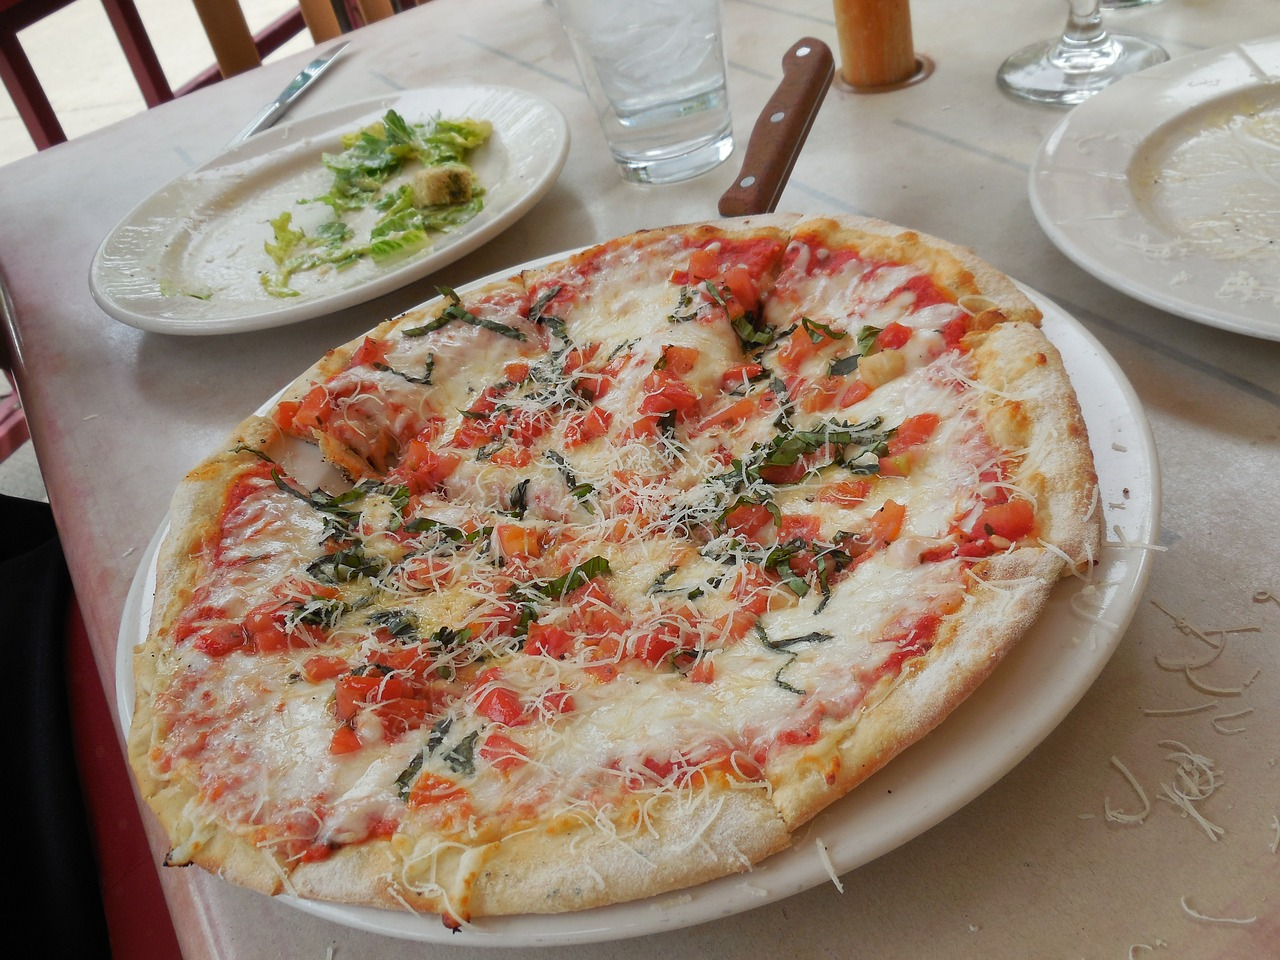 pizza-435930_1280.jpg